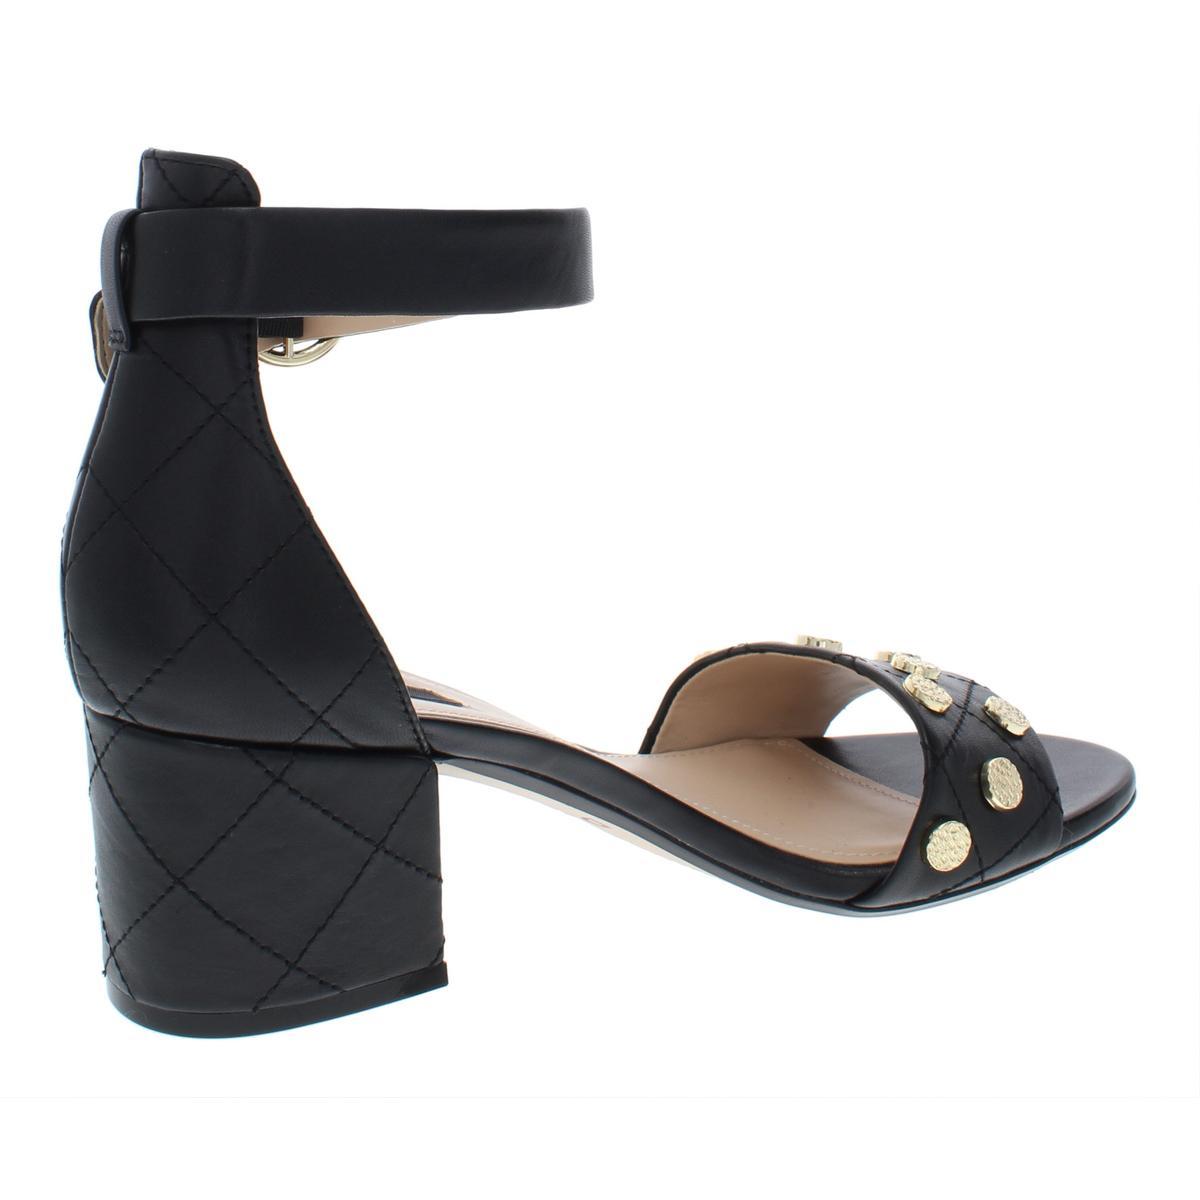 DKNY donna Henli Leather Studded Block Heel Dress Sandals Evening Evening Evening BHFO 4238 7f4046